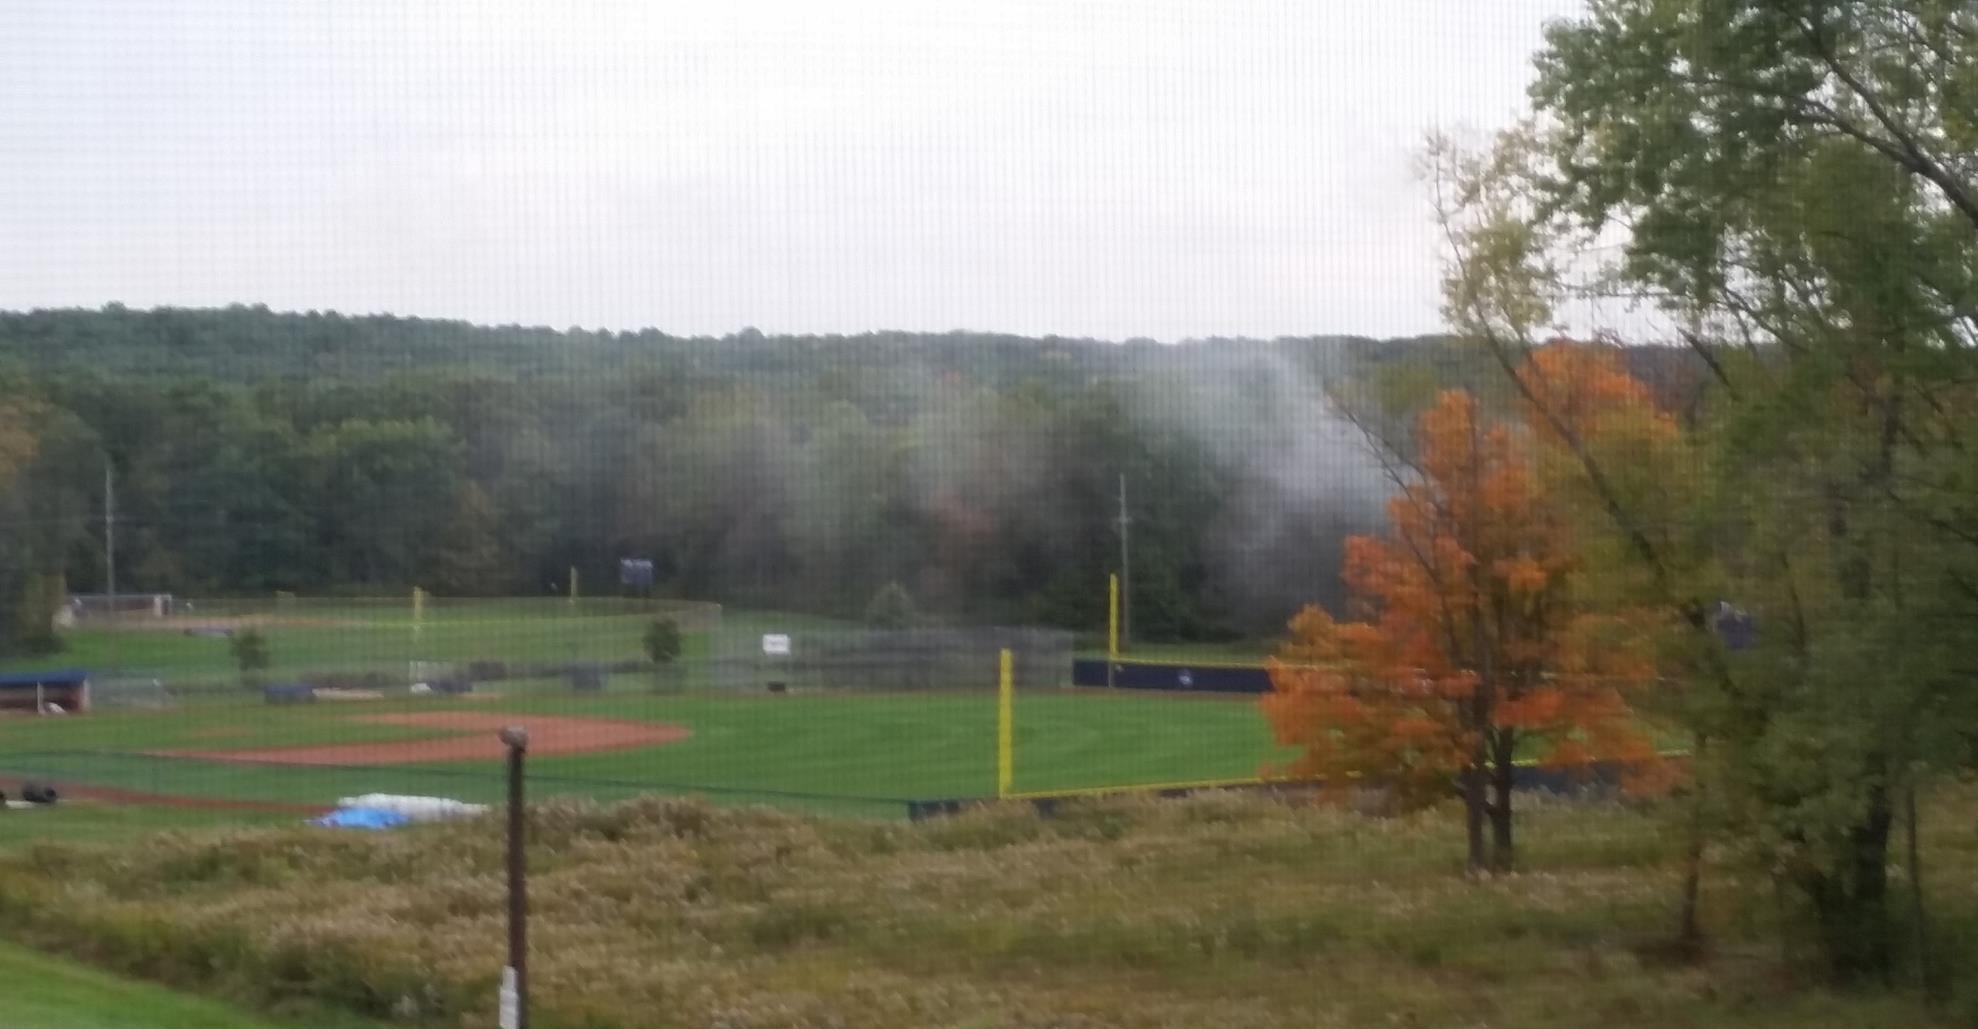 Tomcat Field and treeline at Thiel College